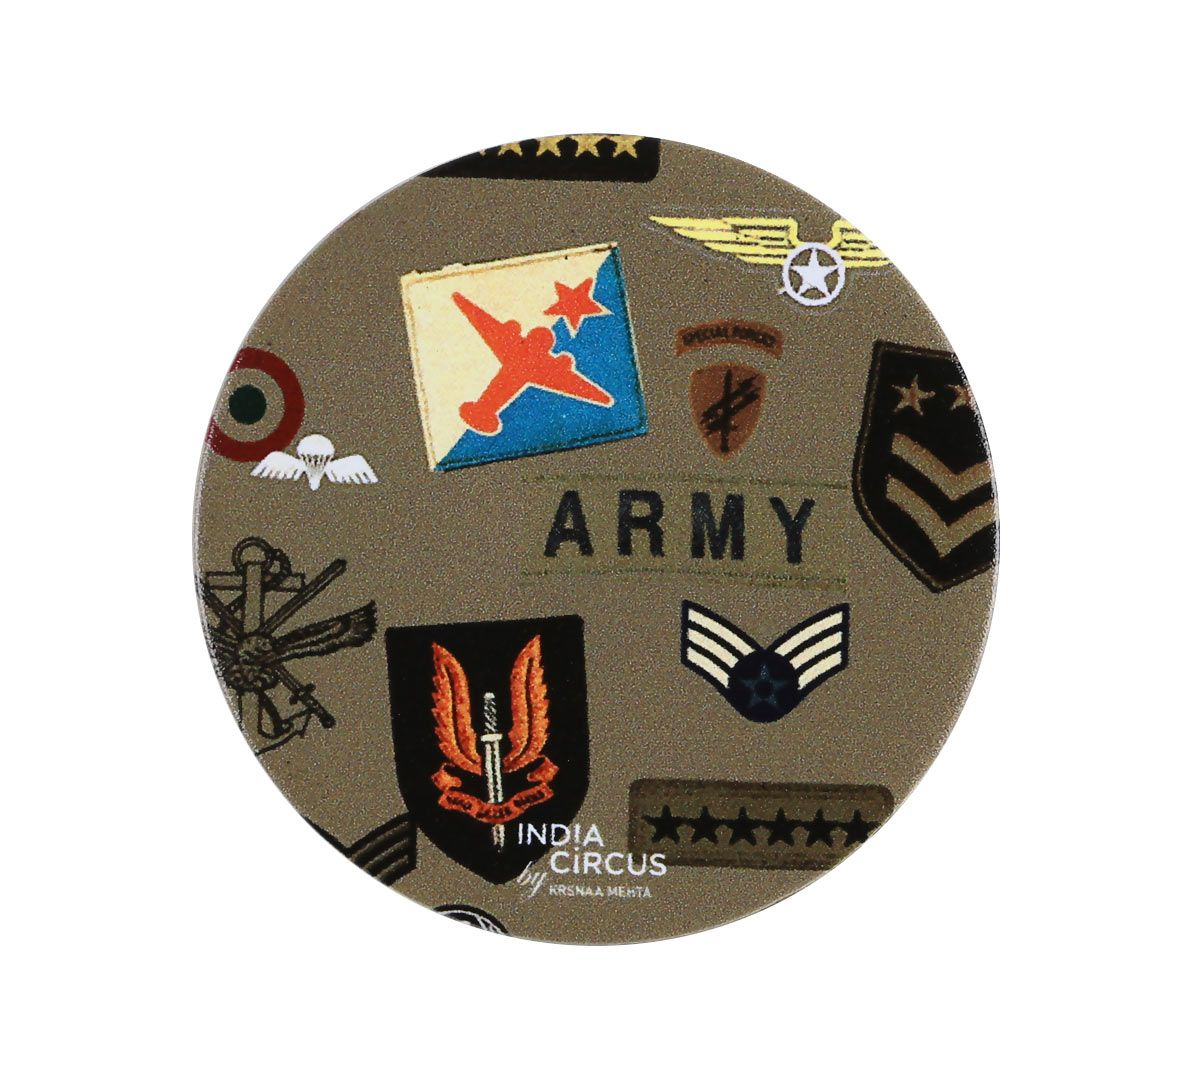 India Circus Army Badges Rush Popsocket